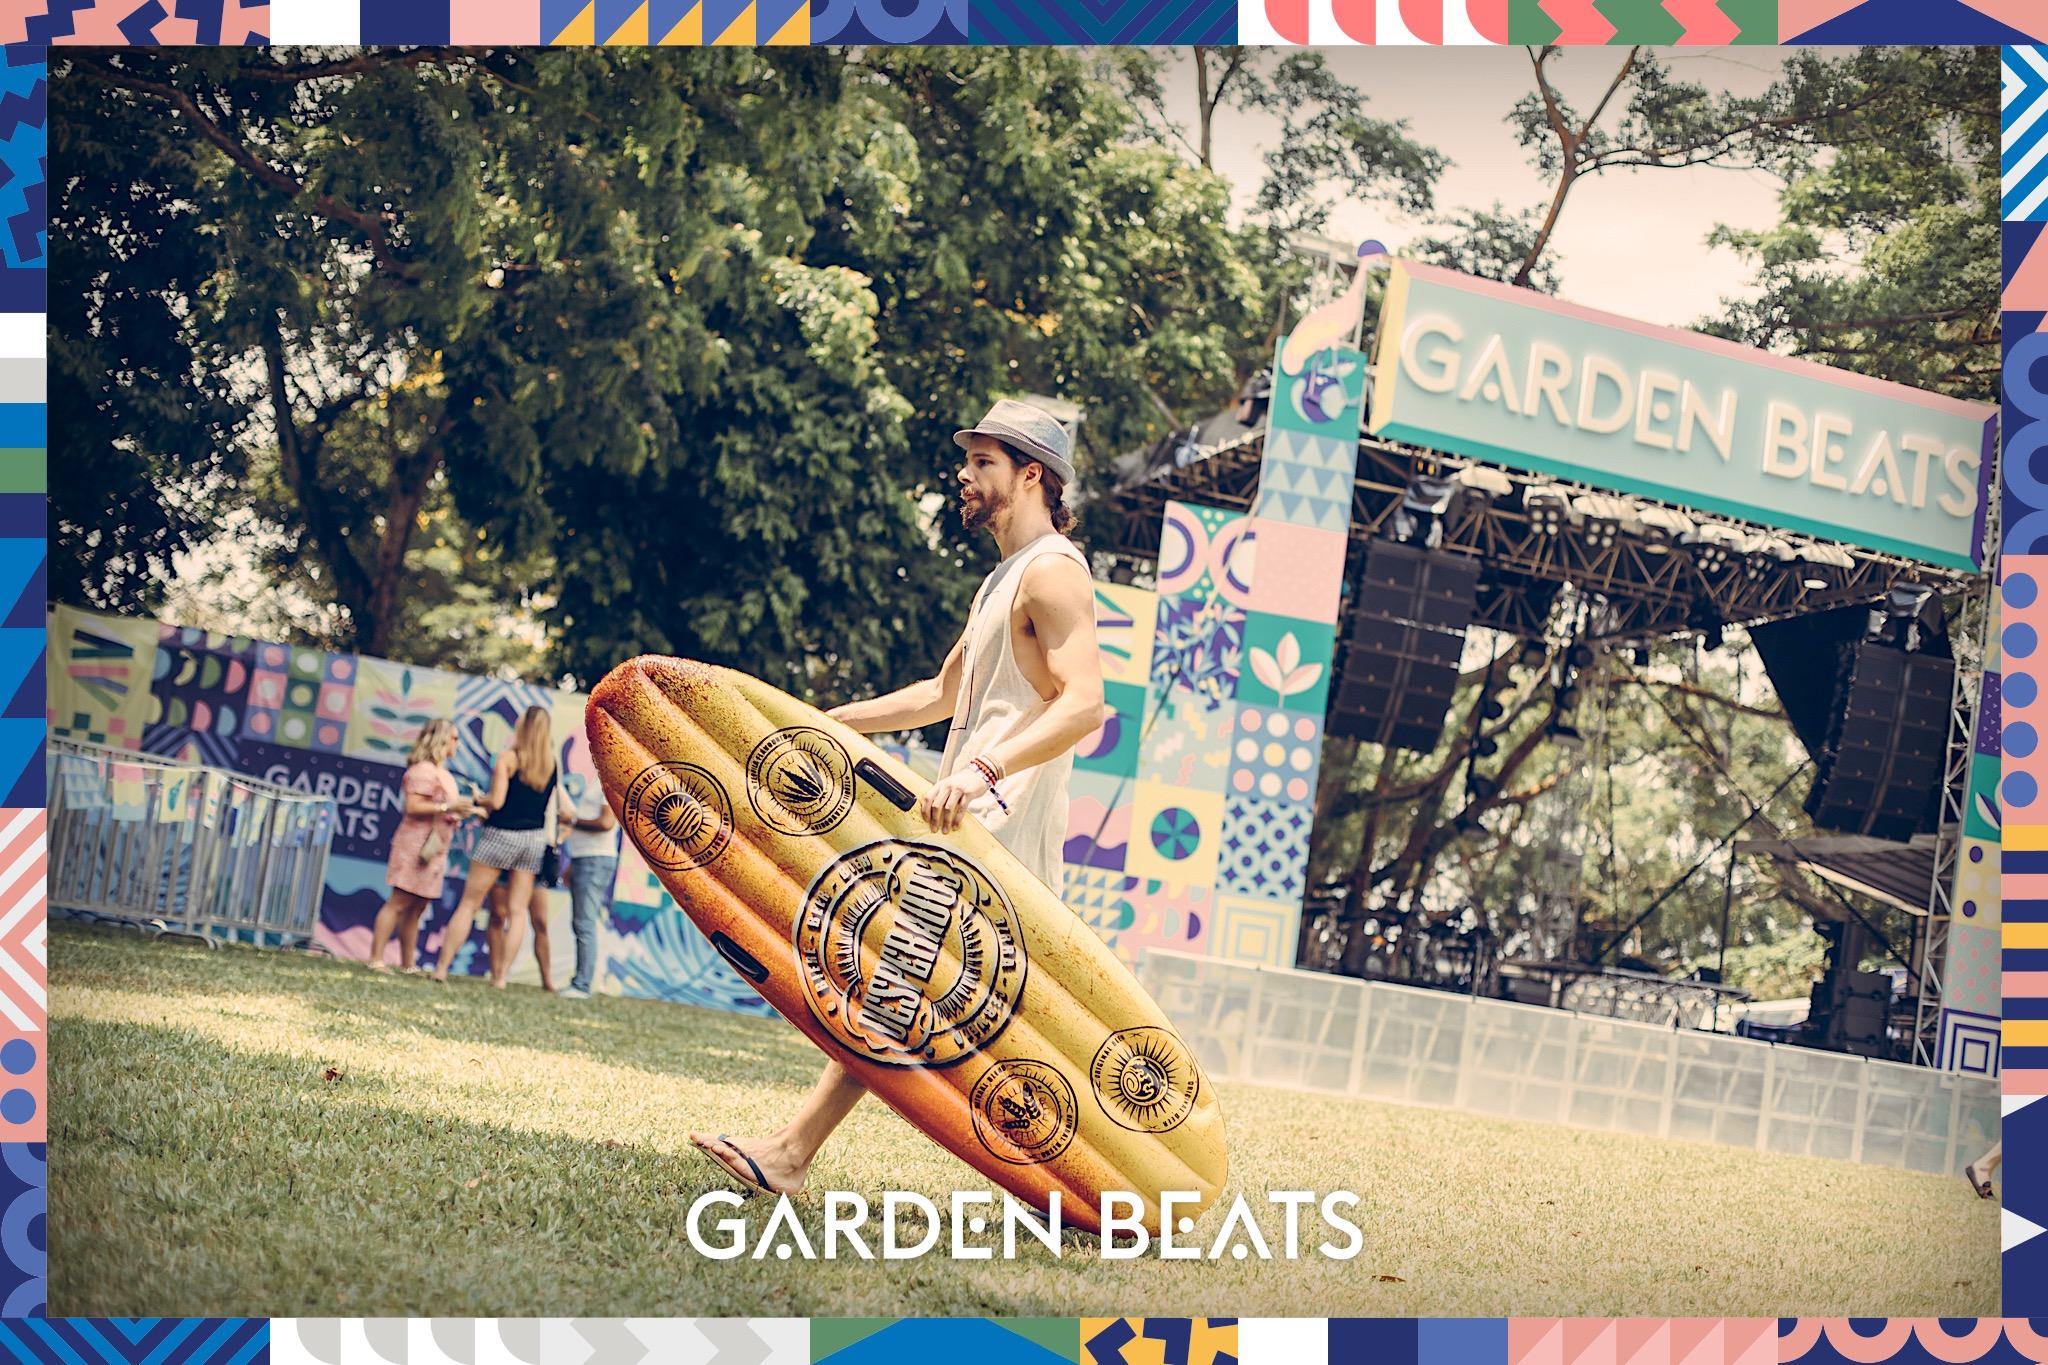 03032018_GardenBeats_Colossal158_Watermarked.jpg